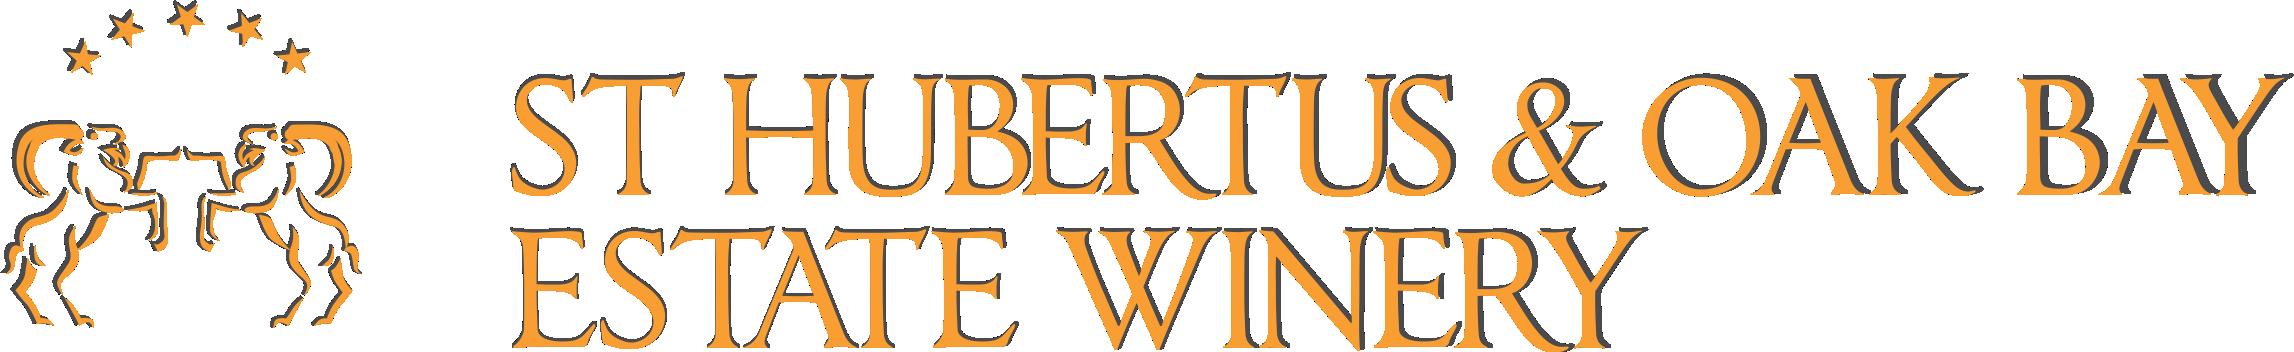 St. Hubertus & Oak Bay Estate Winery Ltd